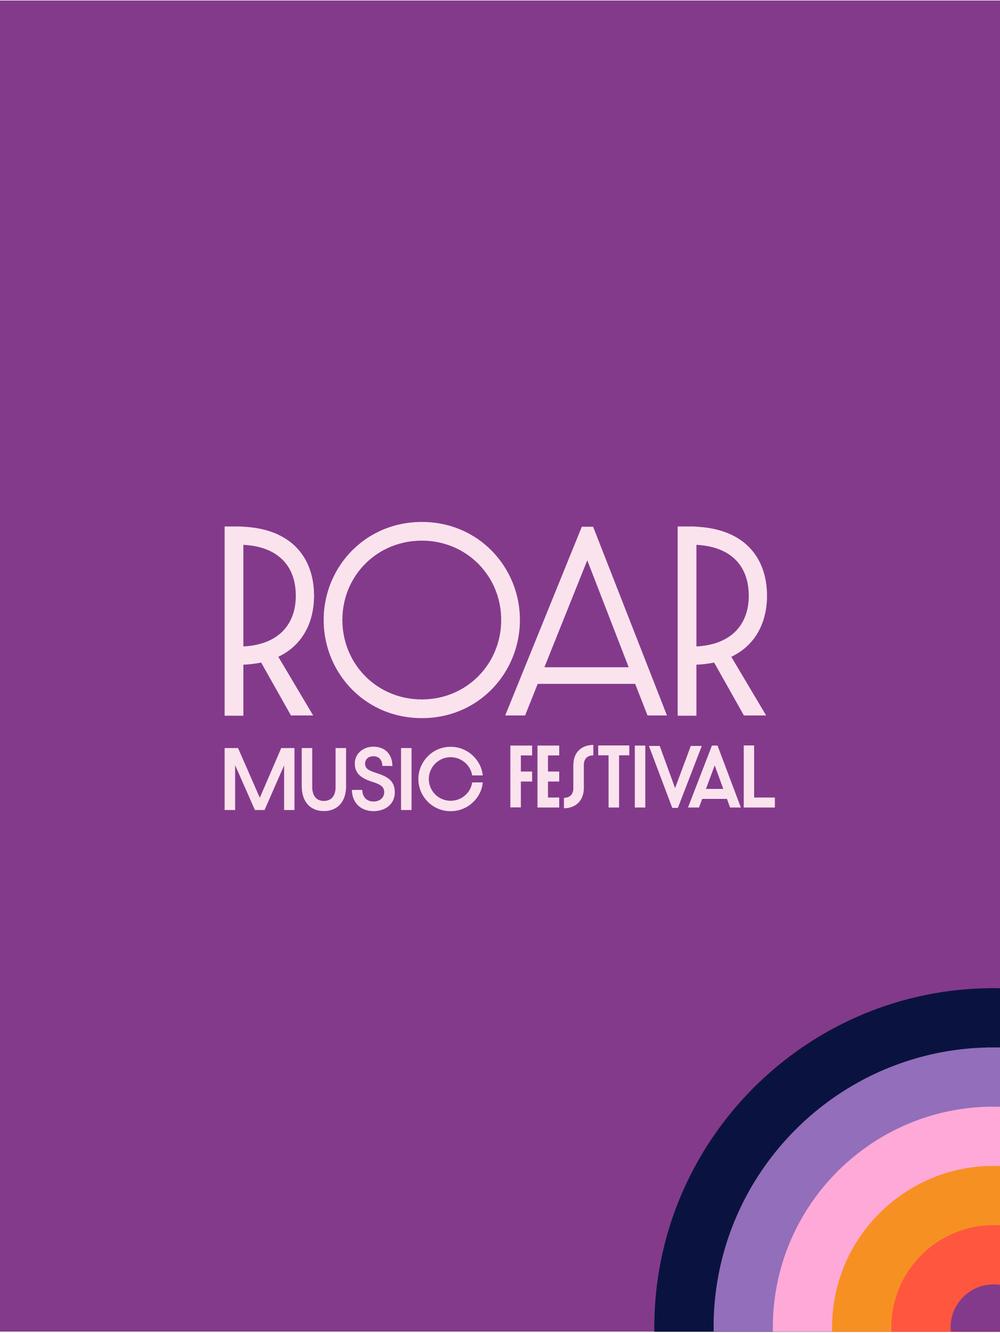 RoarFestival_WeblayoutPortfolio_27Aug2017-06.png